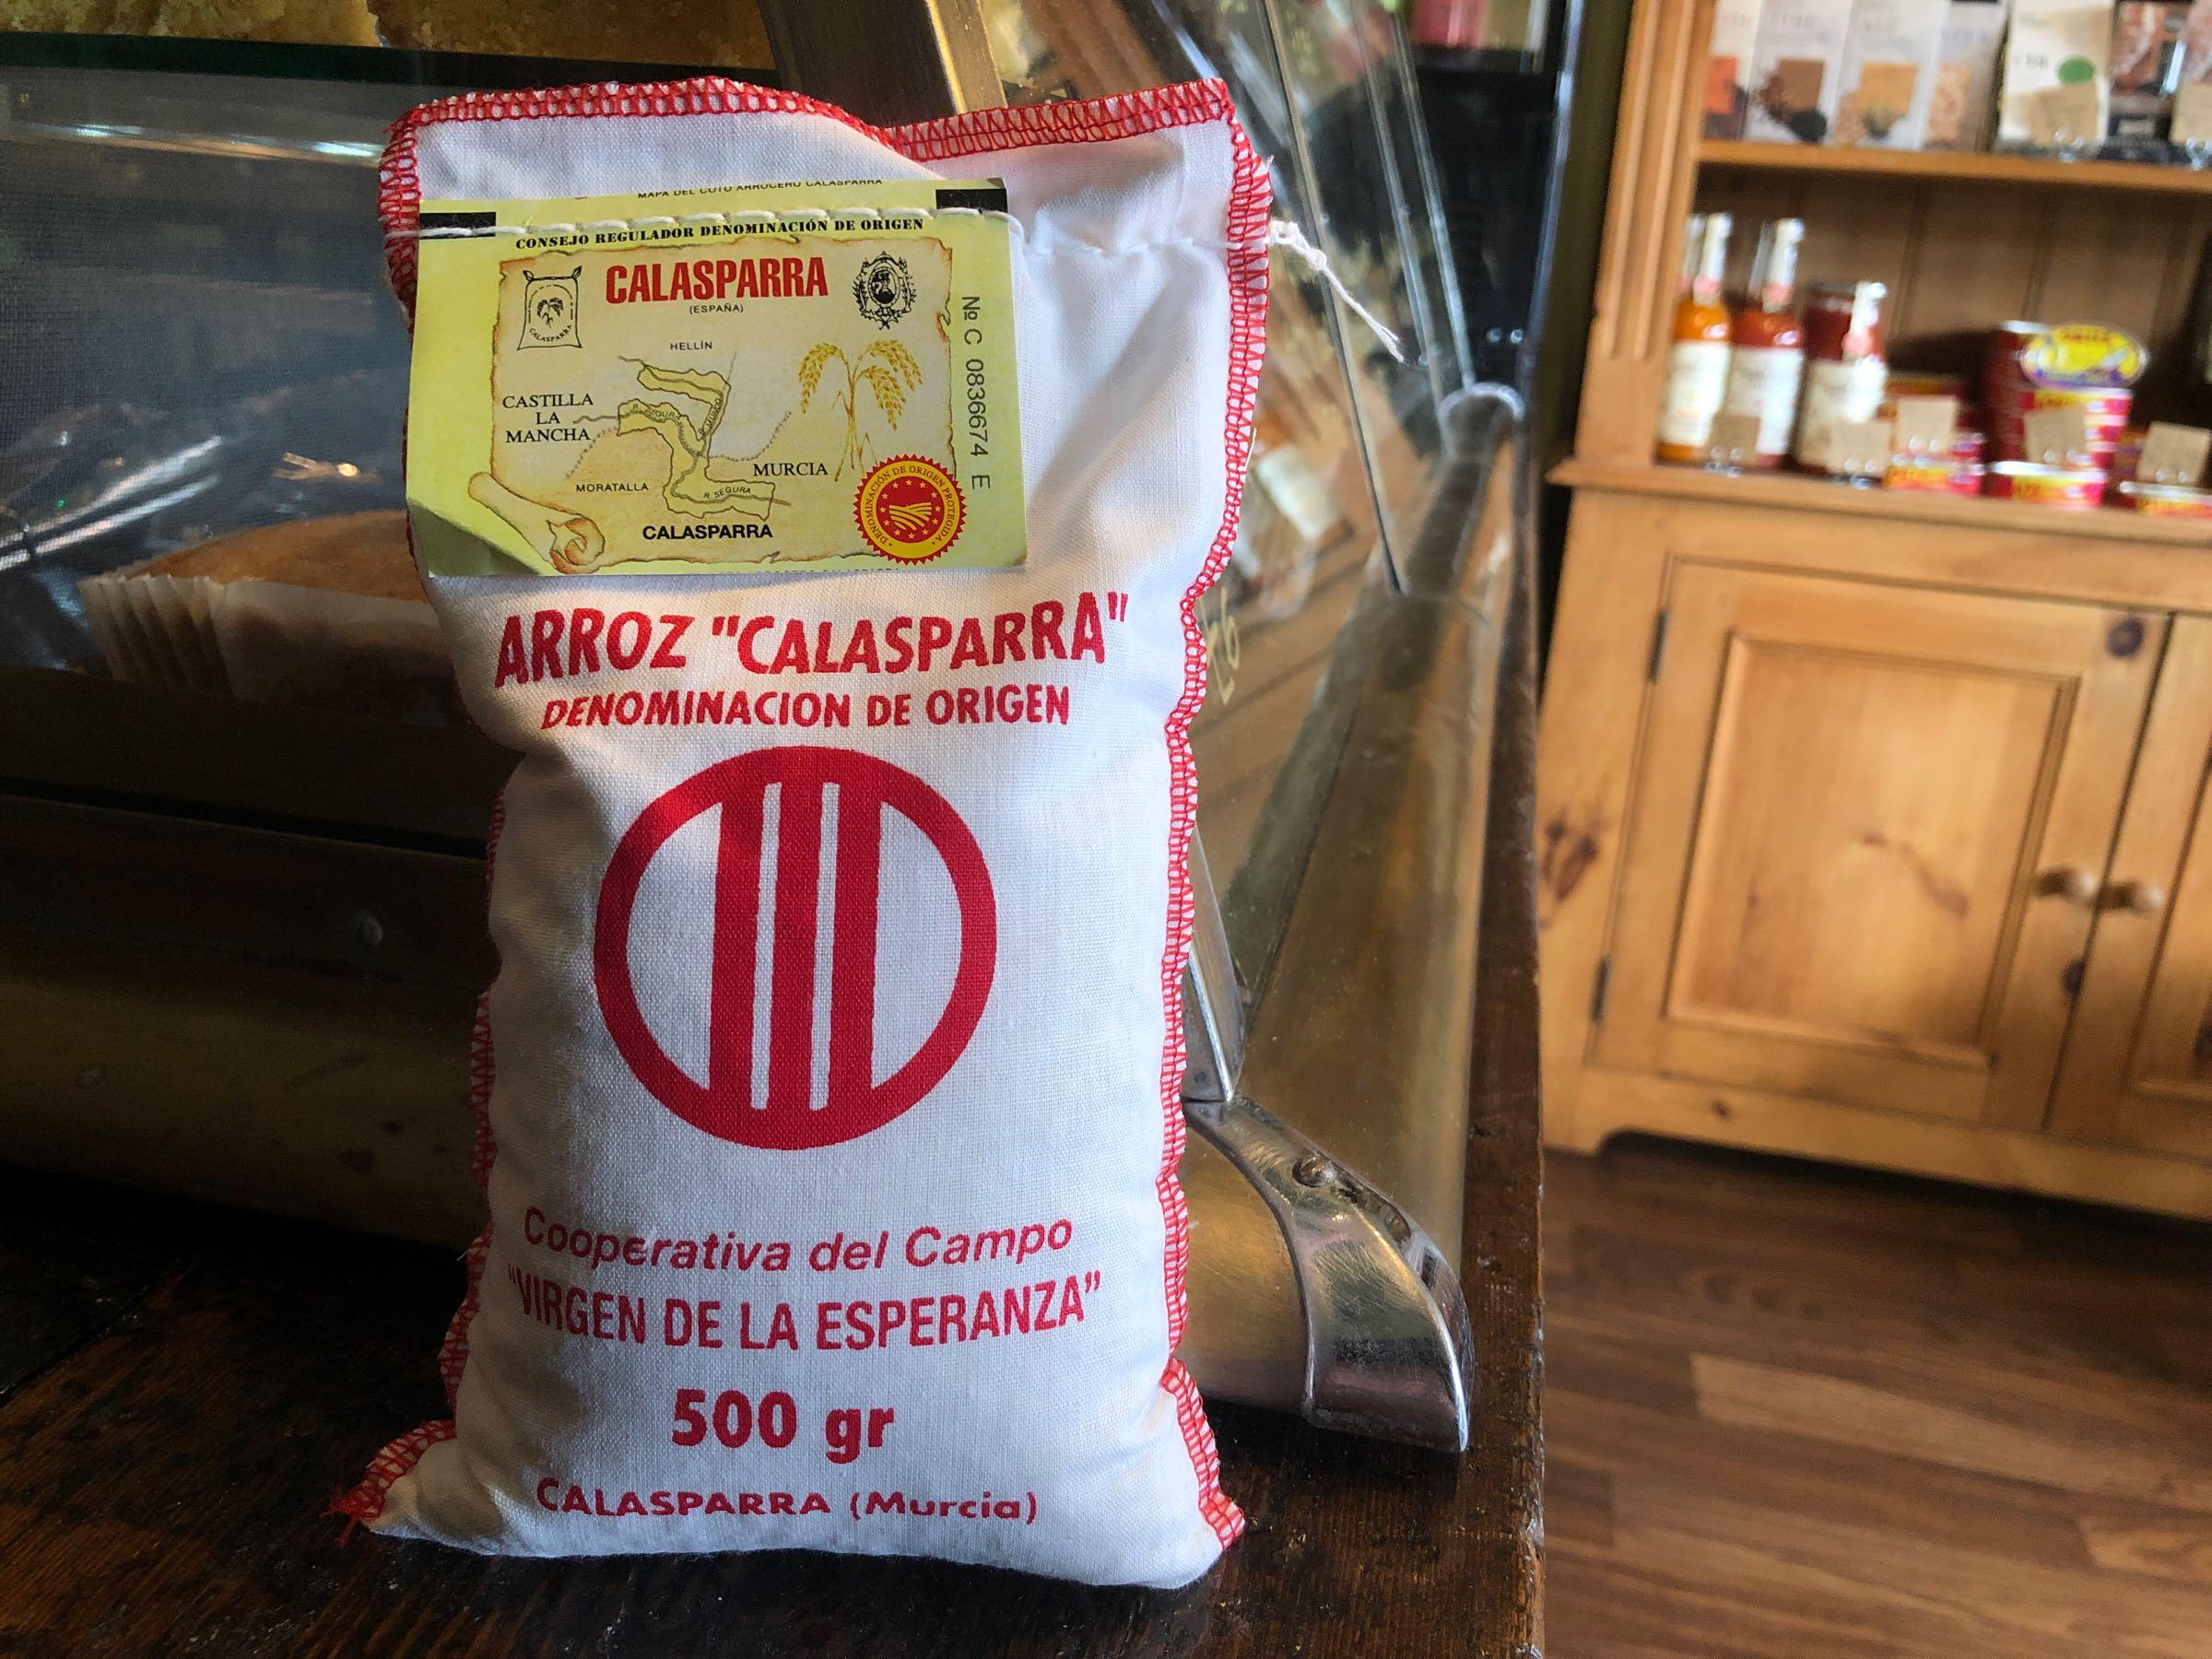 Calasparra white paella rice DOP 500g